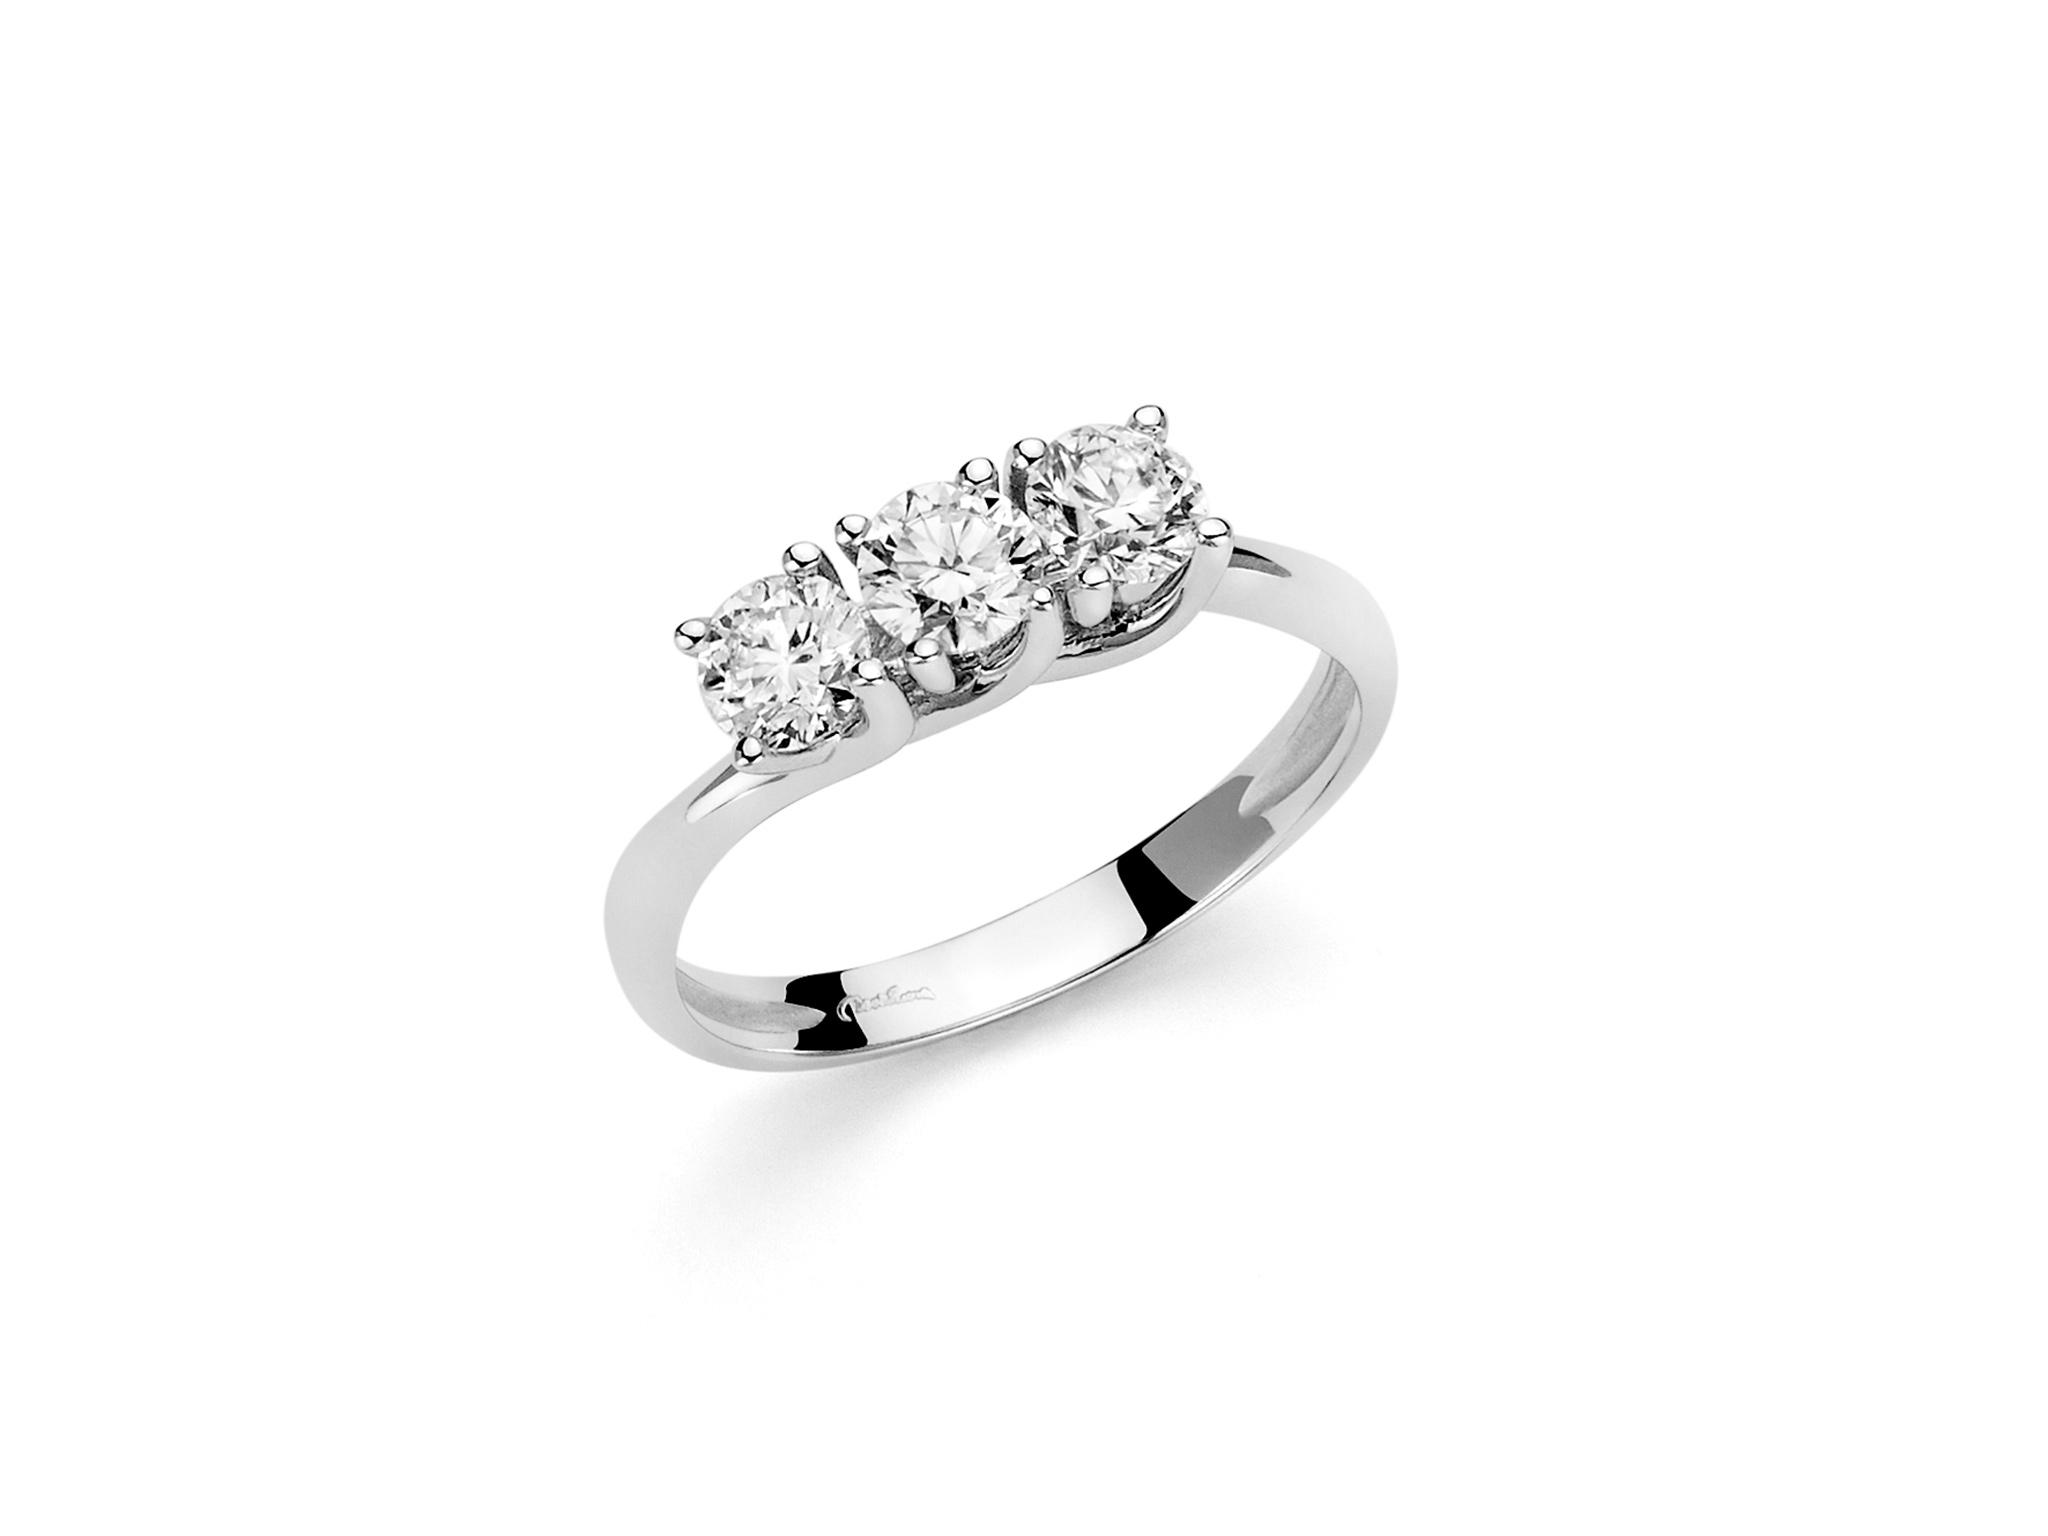 Trilogy in oro e diamanti. - LID3295-024G7